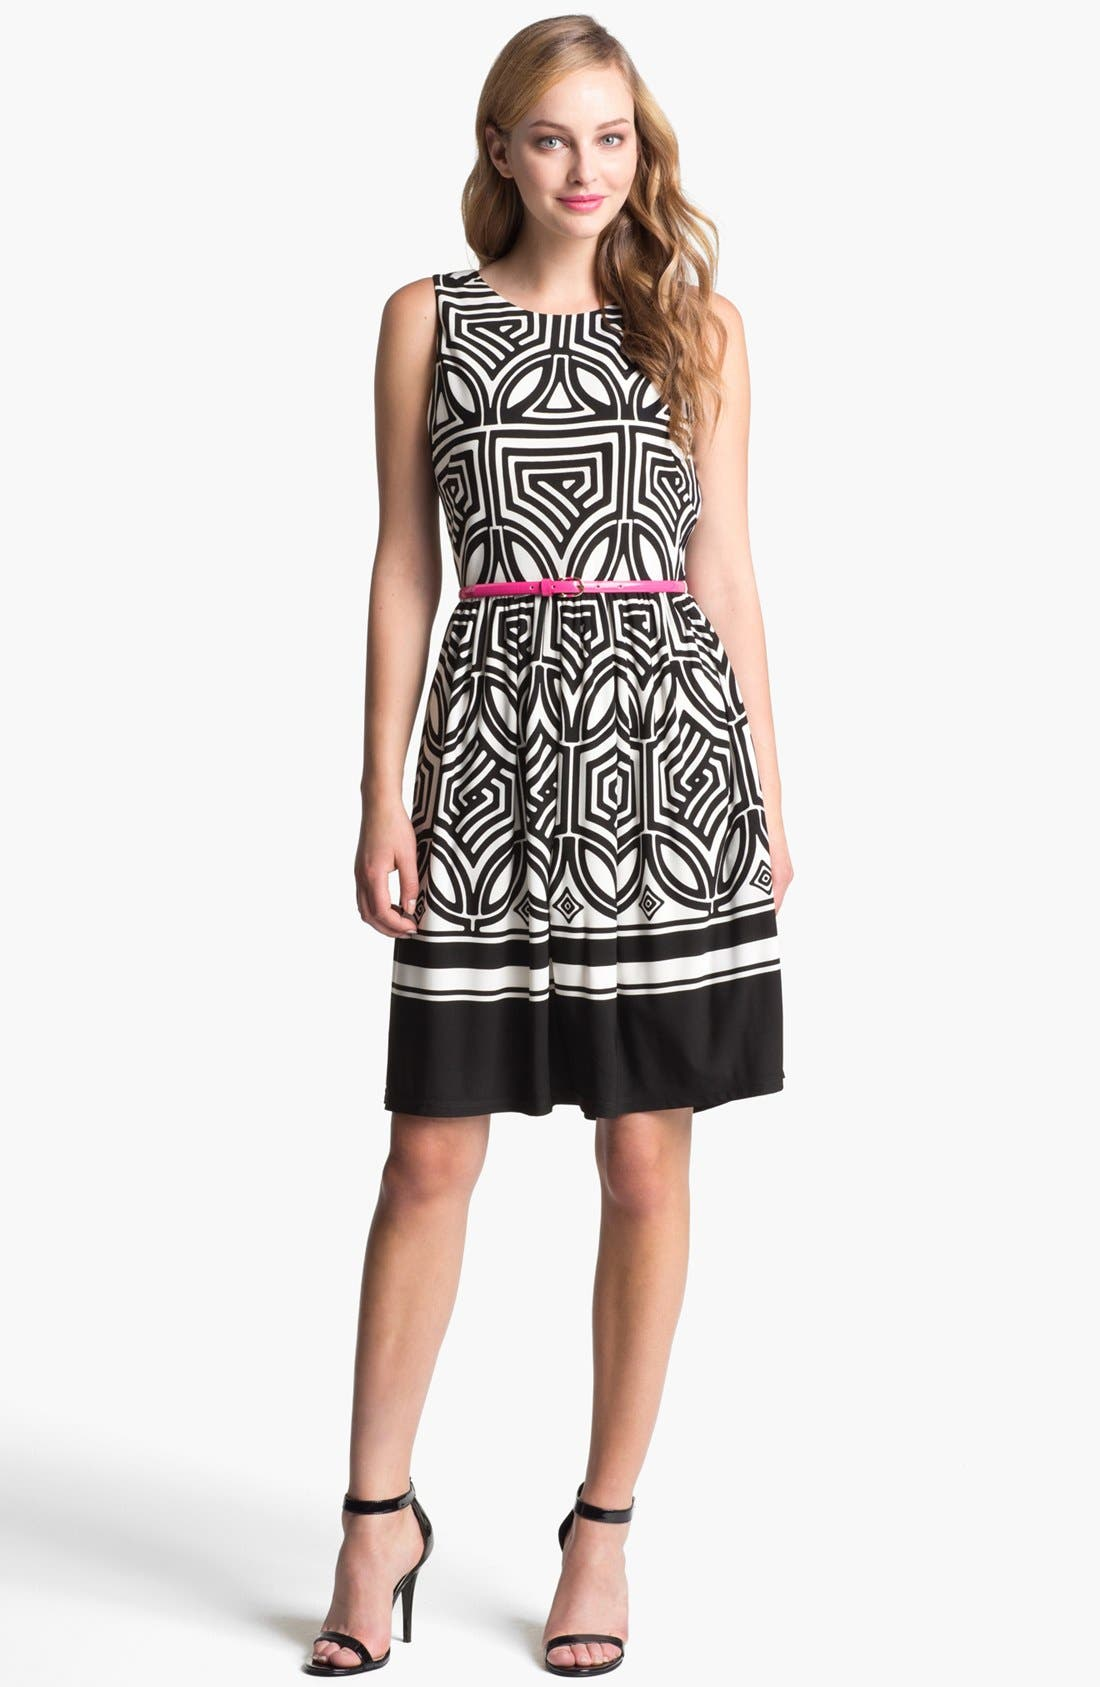 Alternate Image 1 Selected - Eliza J Stretch Fit & Flare Dress